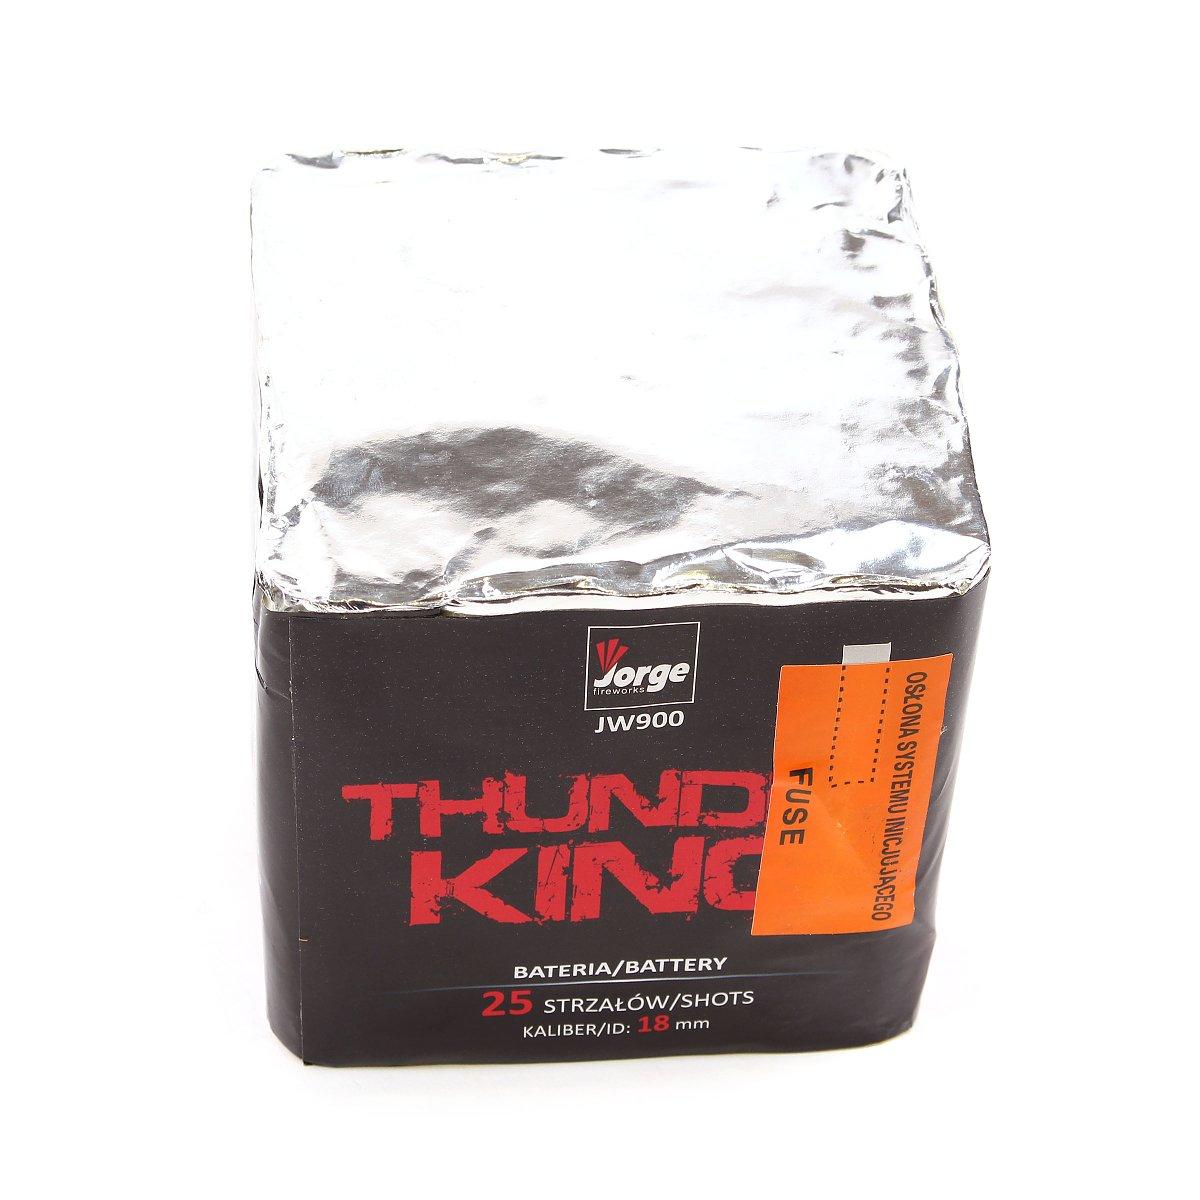 Jorge Thunder King - Feuerwerksvitrine